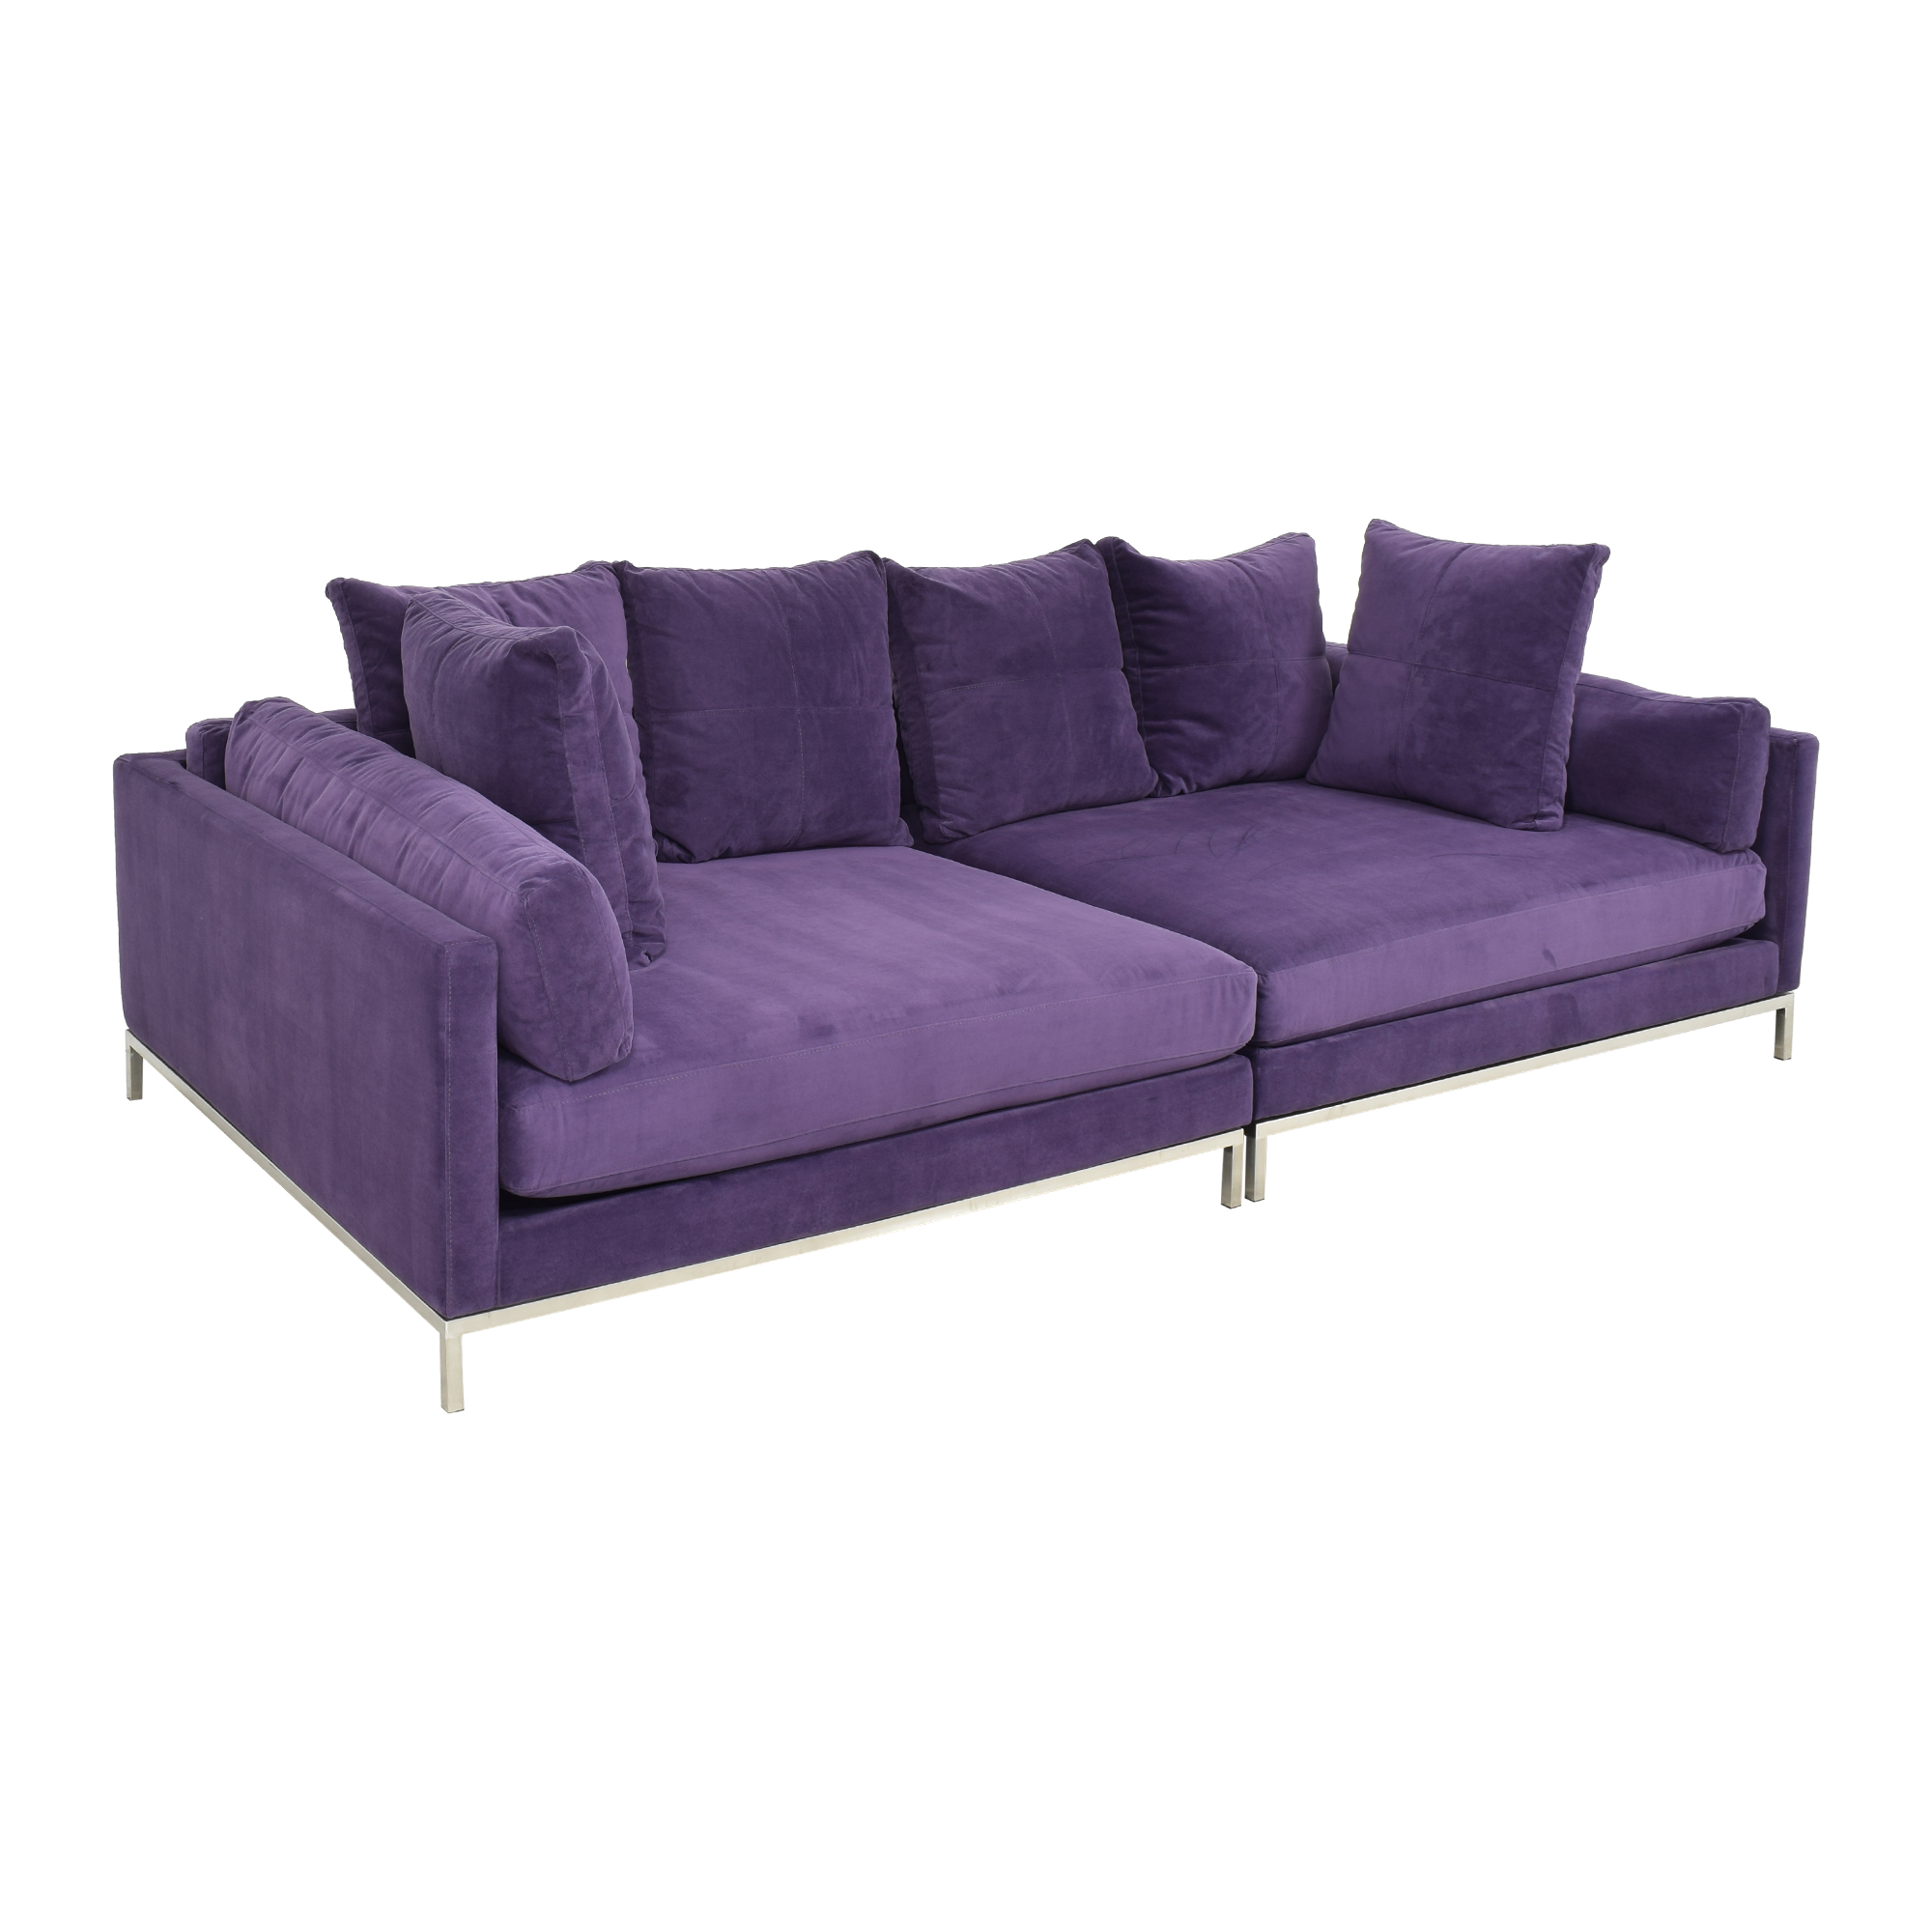 31 Off Z Gallerie Z Gallerie Ventura Extra Deep Sectional Sofa Sofas